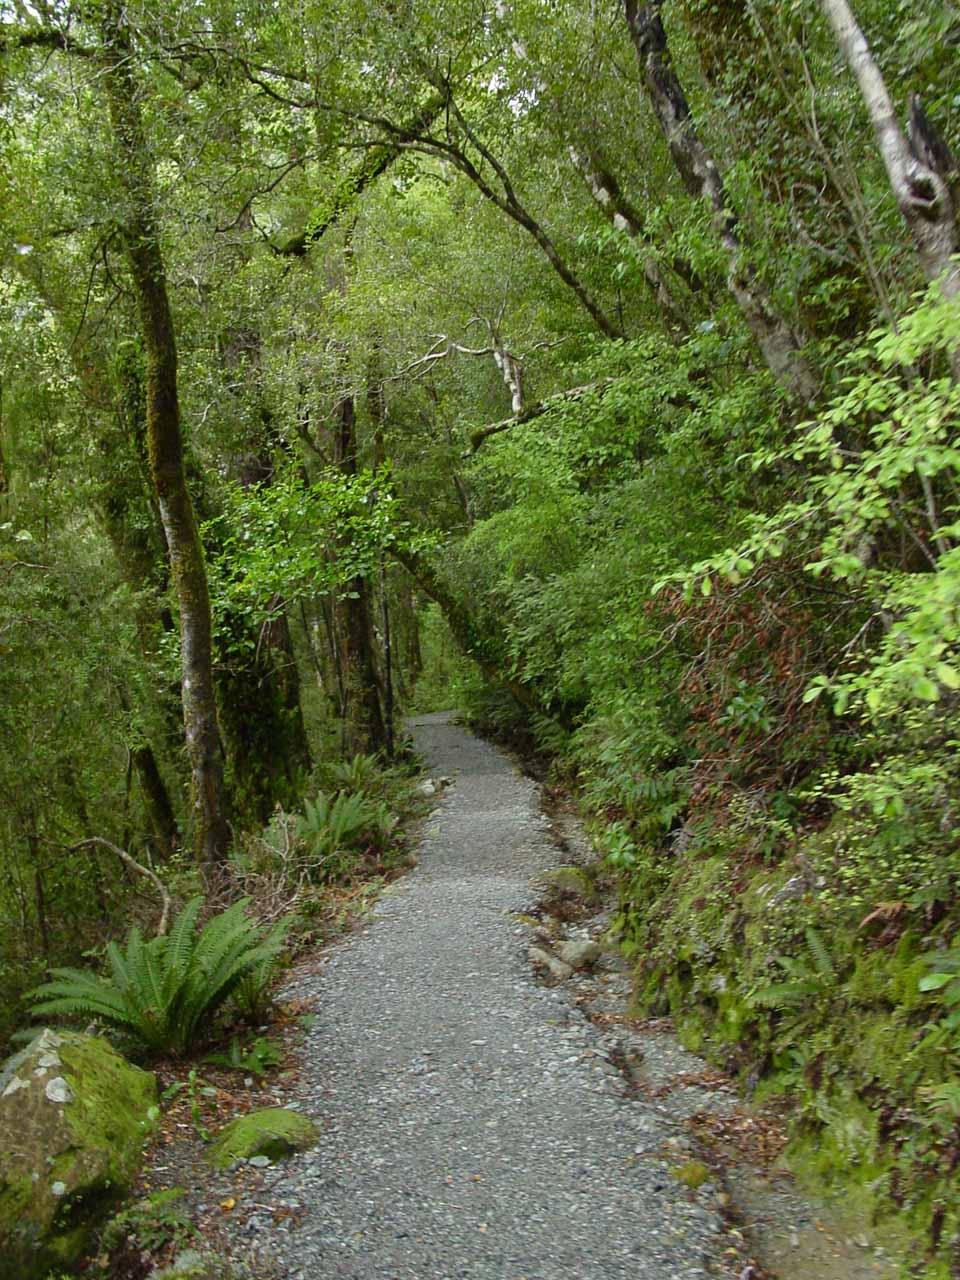 On the established track to Humboldt Falls